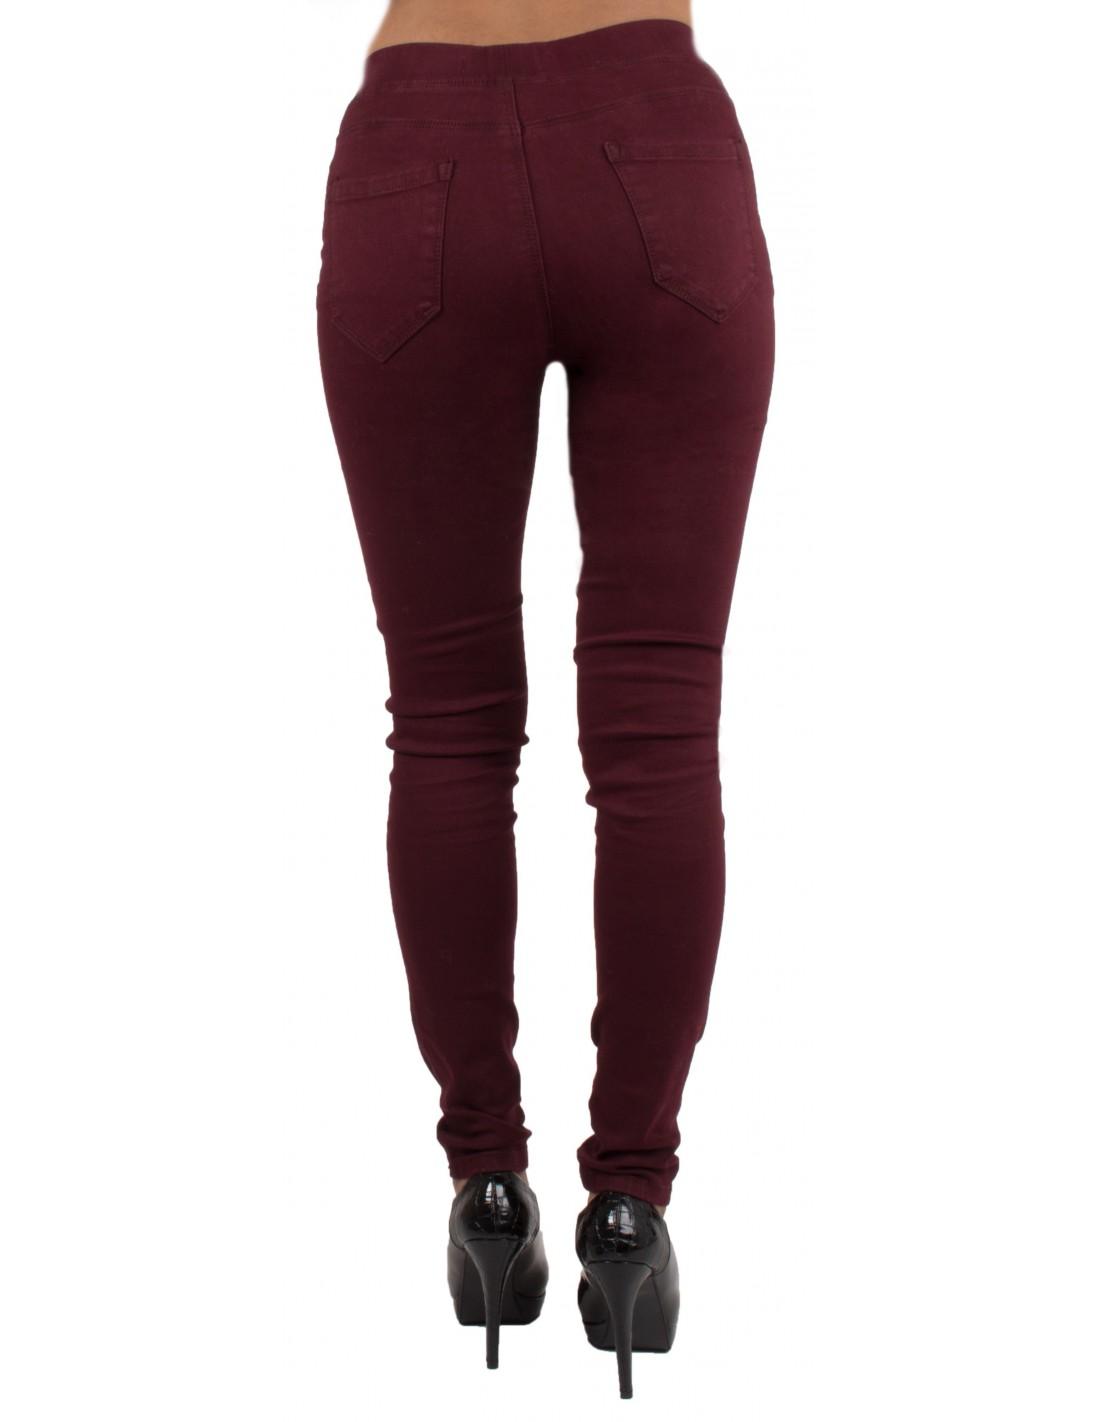 ... Jegging bordeaux taille haute forme jean slim ultra stretch femme